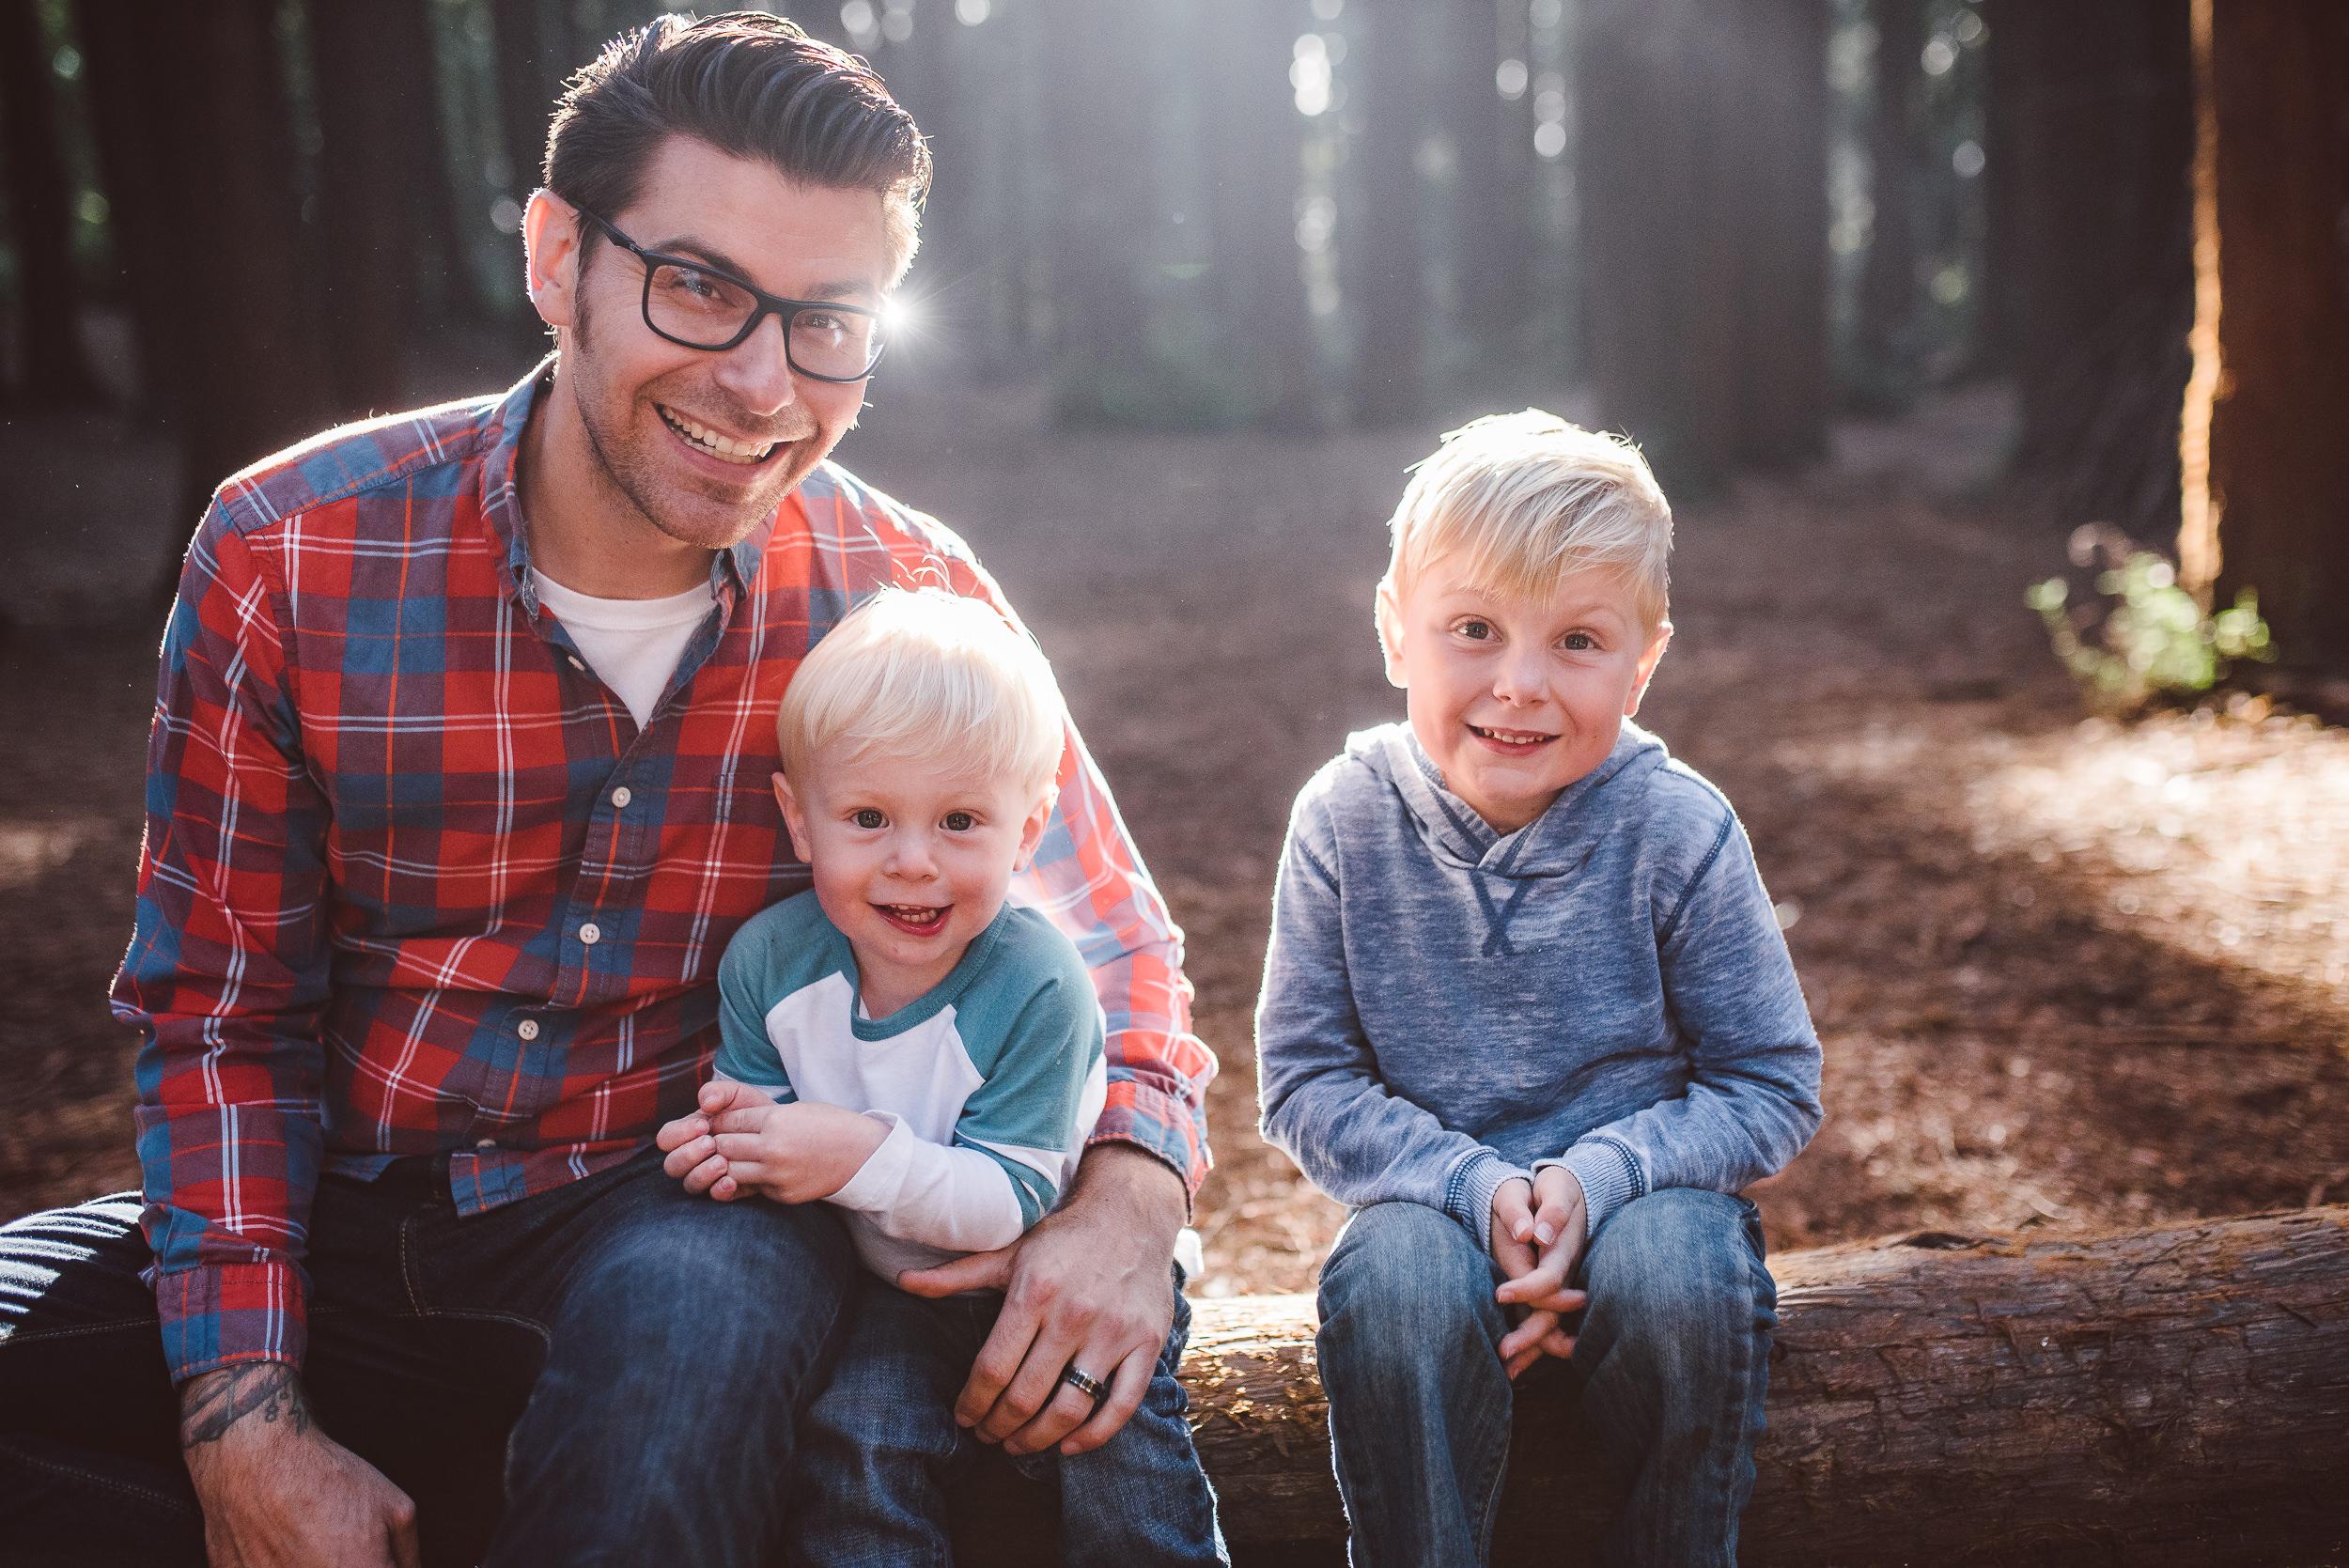 Joaquin-Miller-Park-Oakland-Family-Photography-006.jpg